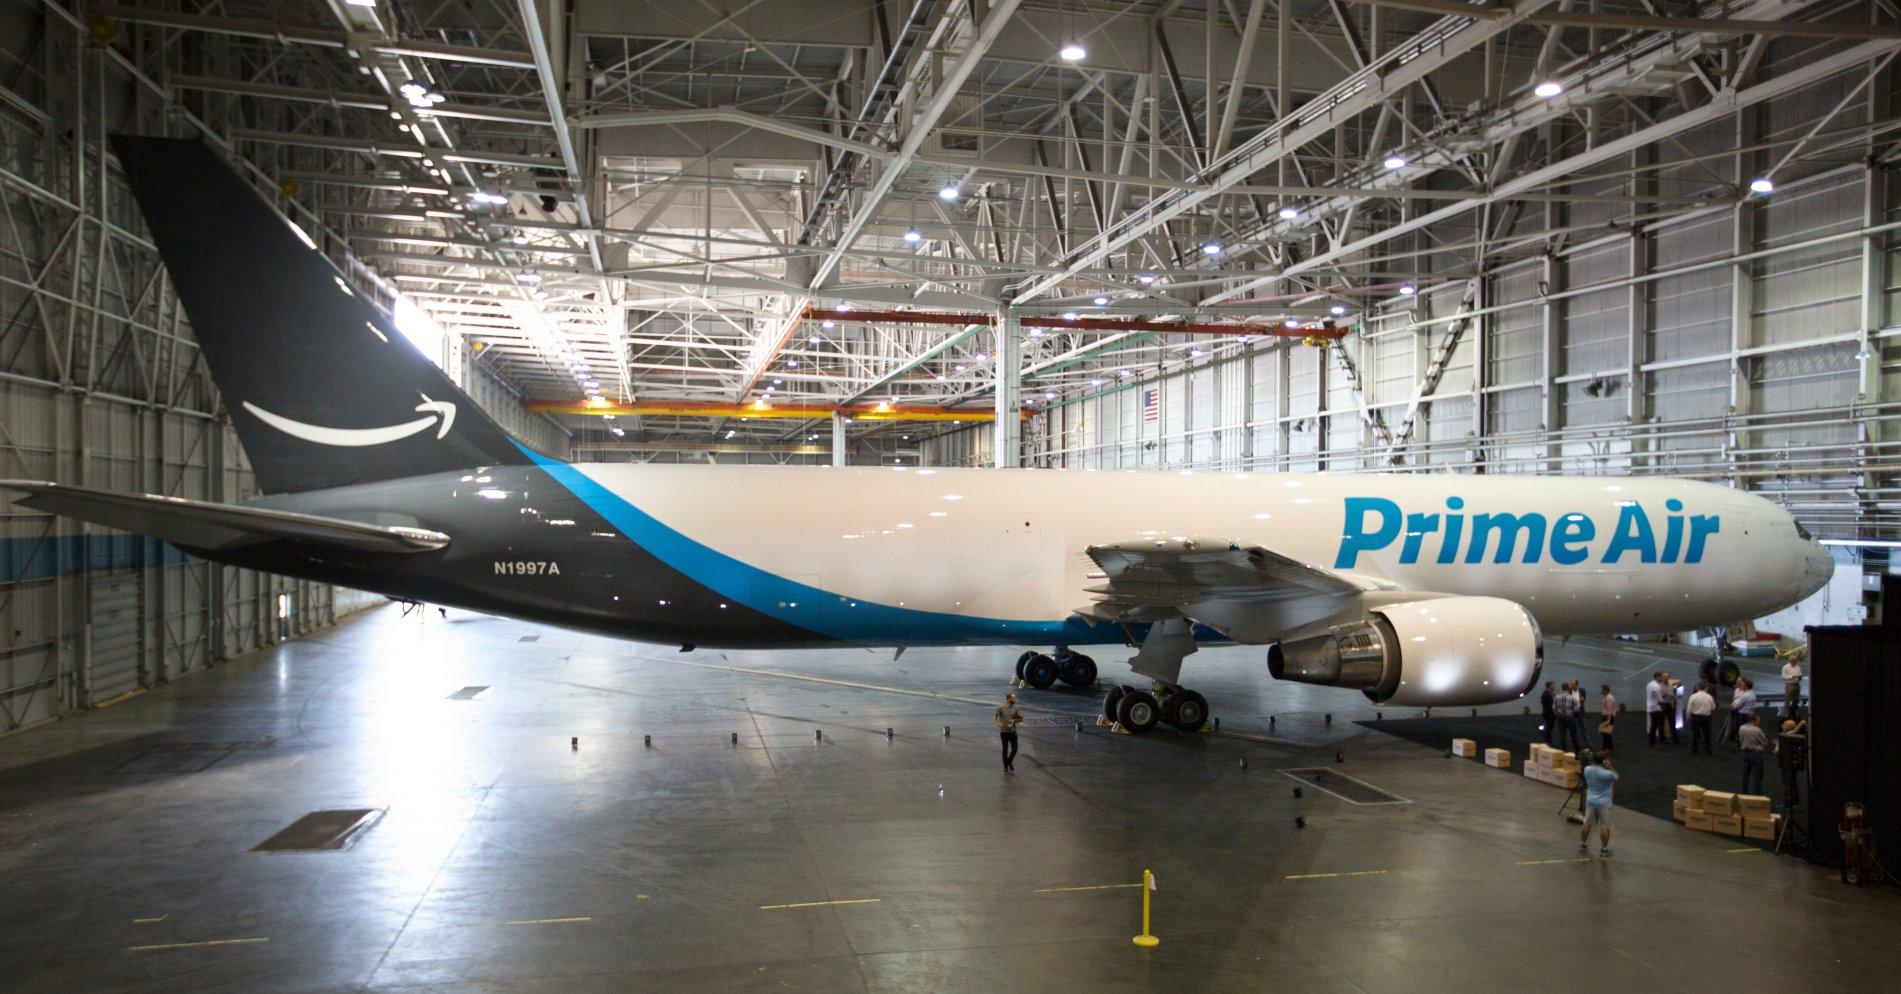 Amazon's Prime Air plane.